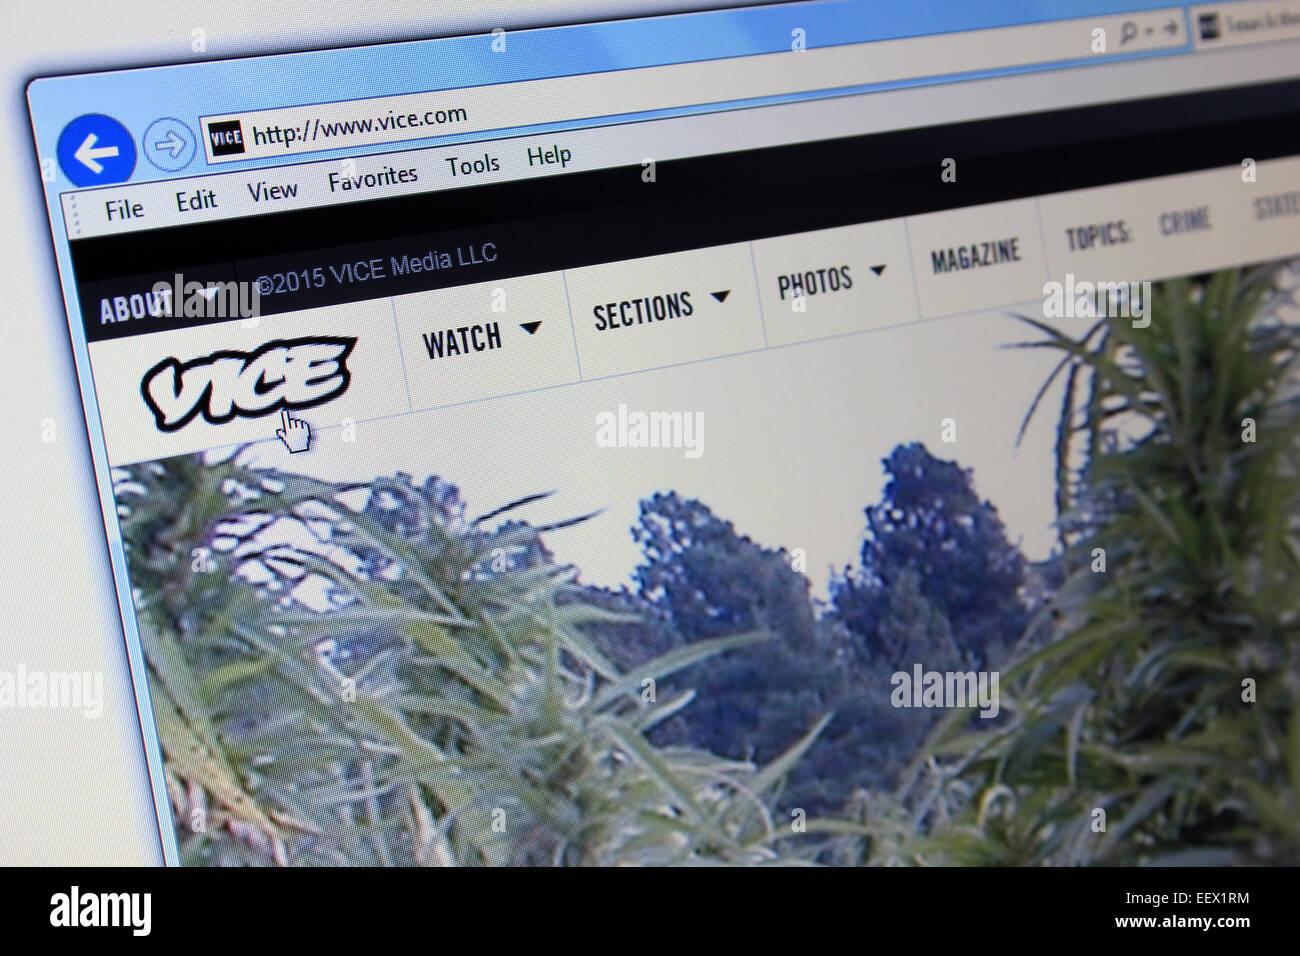 vice.com website - Stock Image